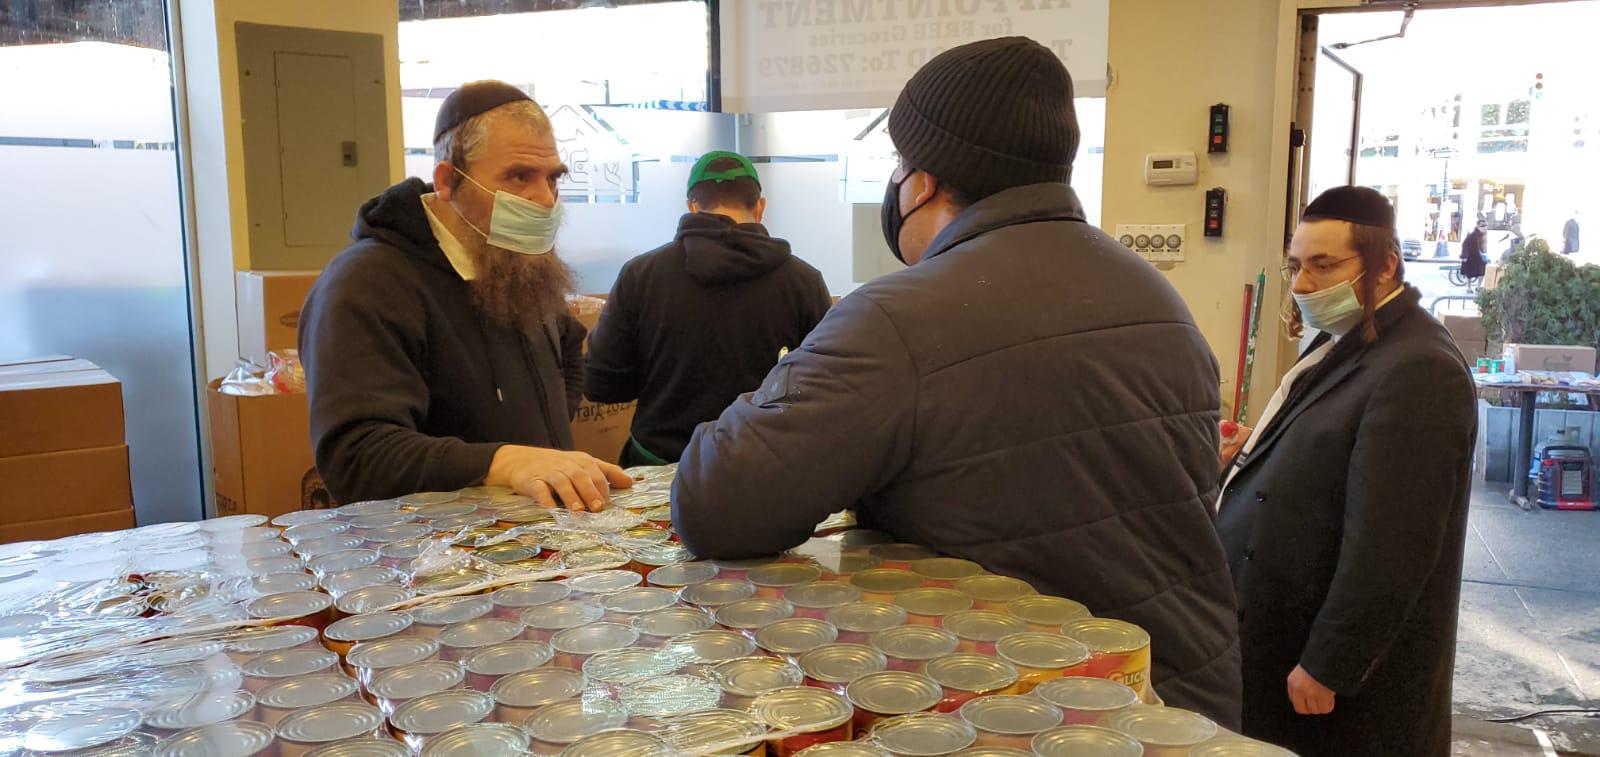 reporter Gabriel Sandoval interviews Shimon Posen at Masbia Boro Park during pandemic